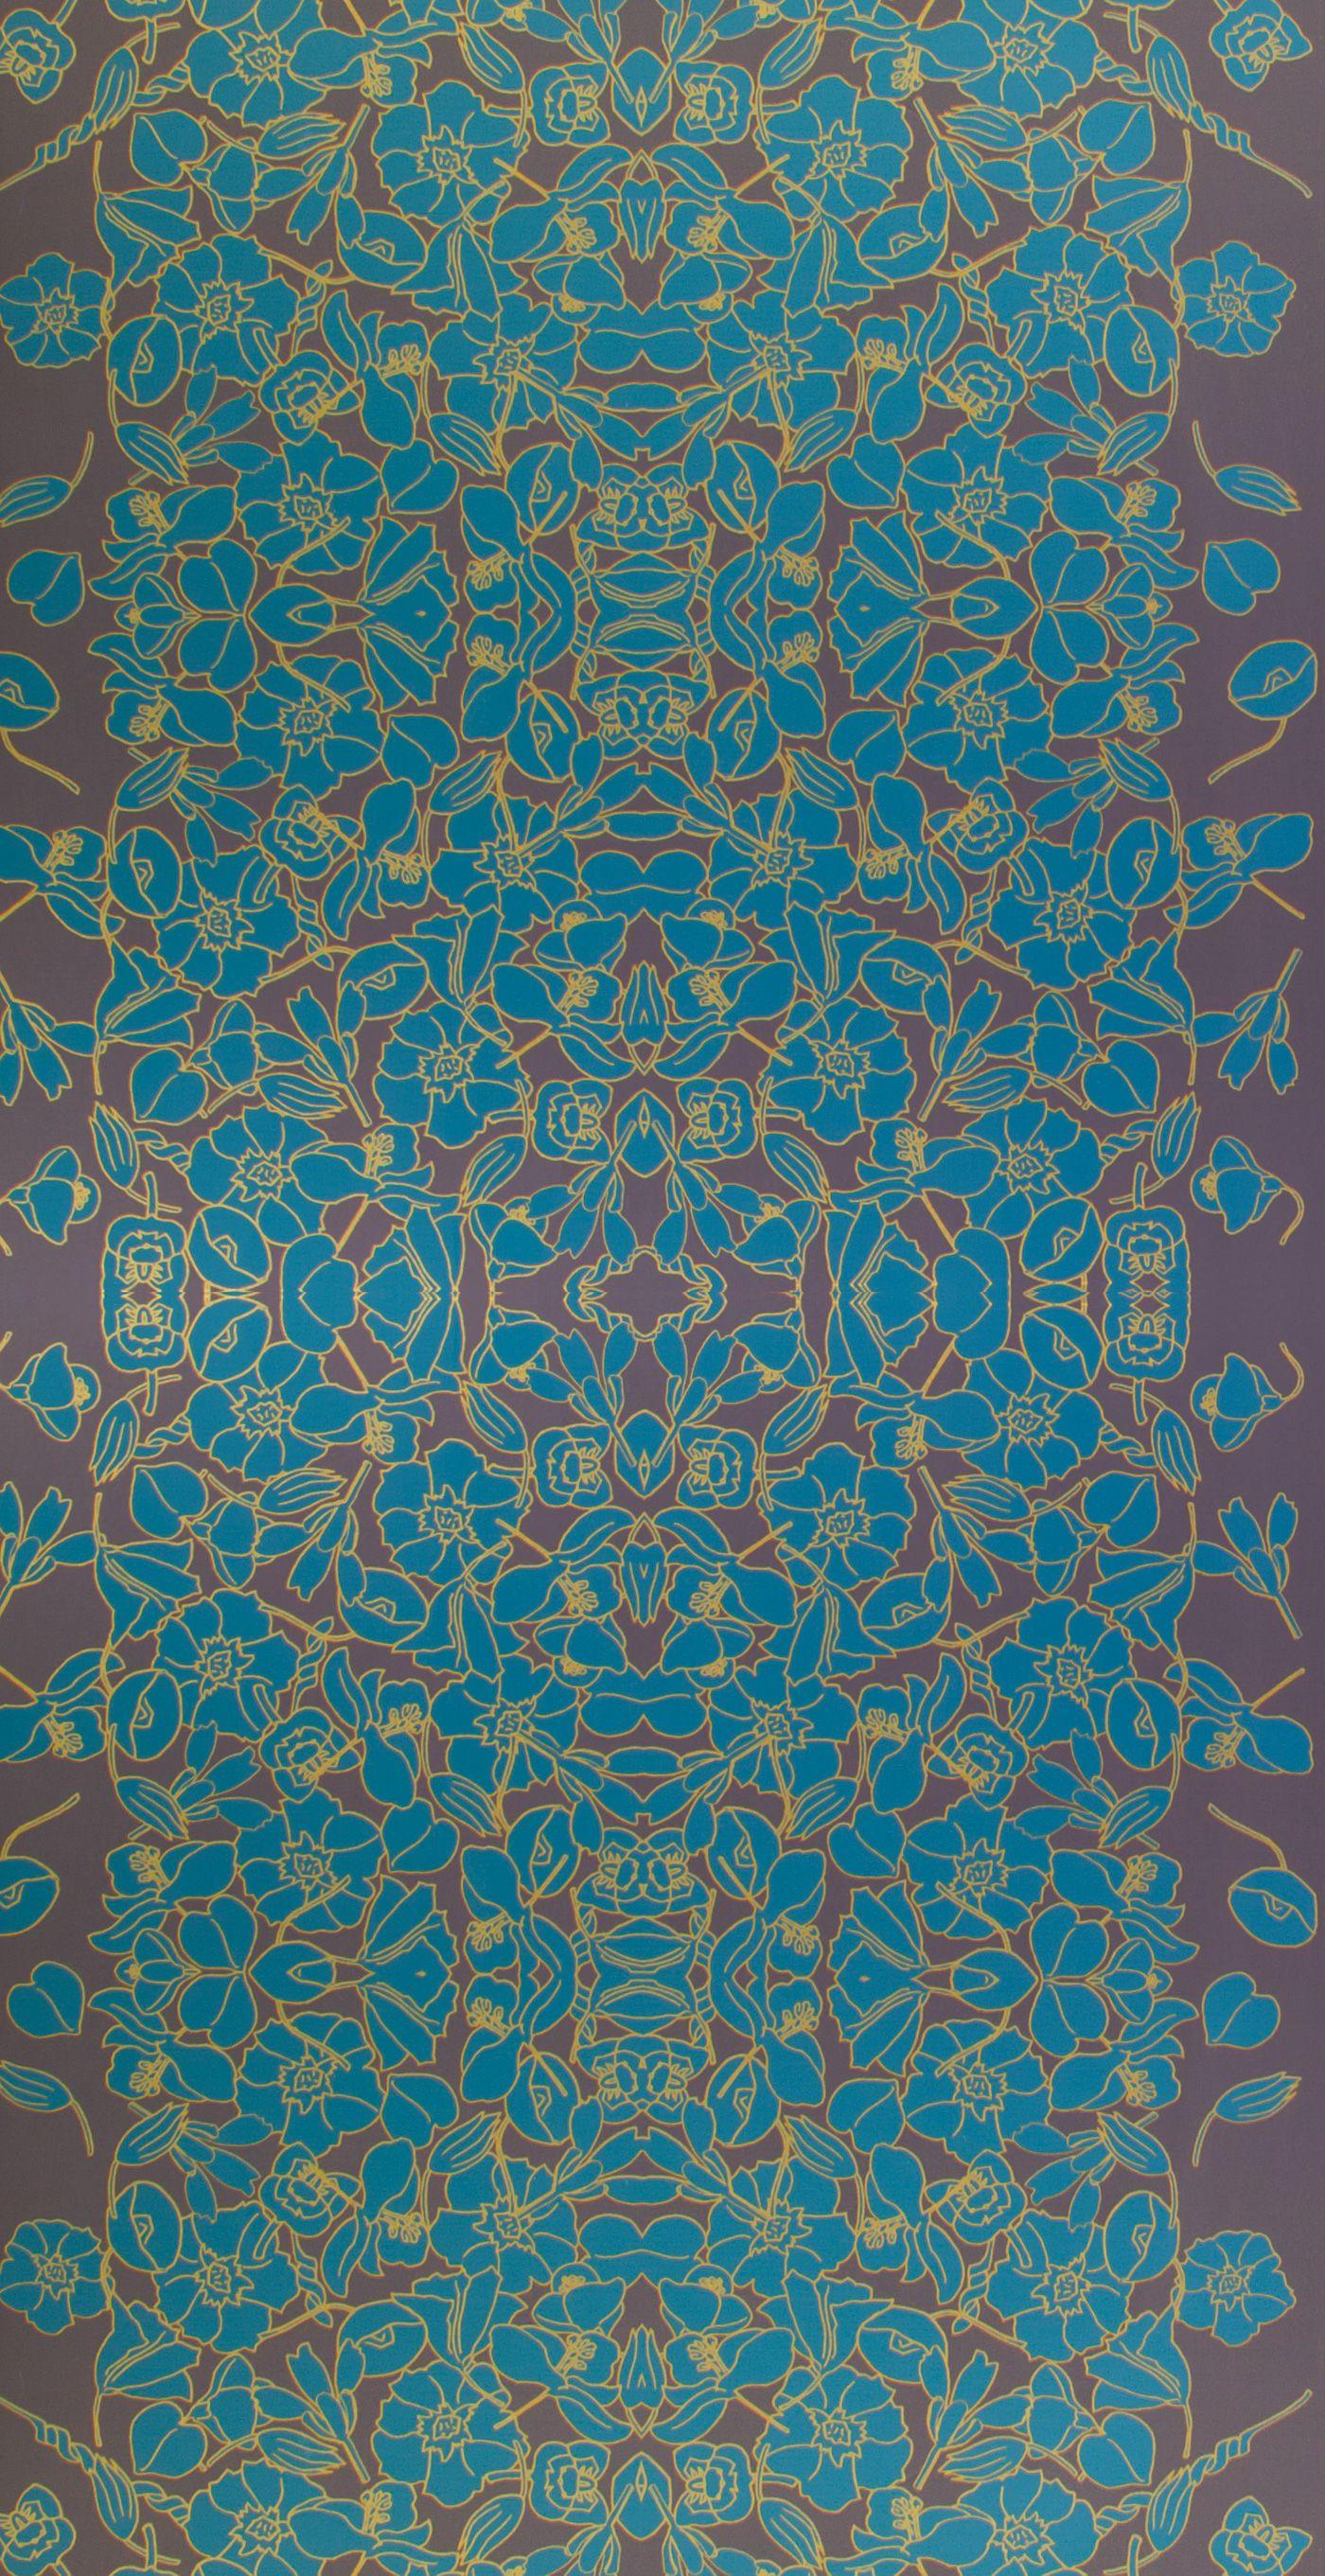 Verdant Vine Scarab flavor paper Wallpaper, Paper, Wall